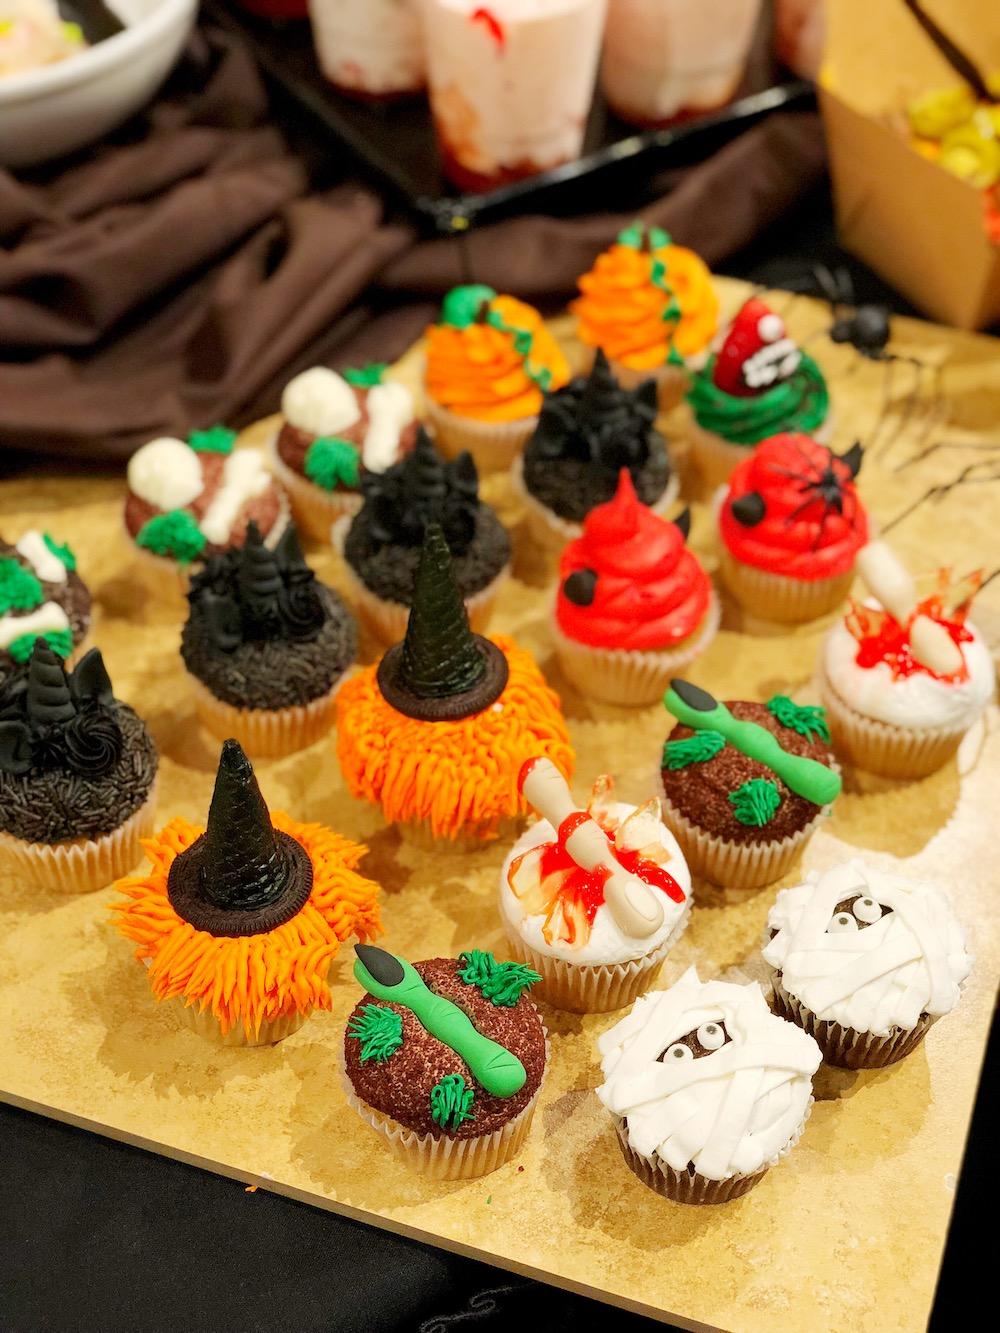 Cute halloween cupcake designs. Get it during Knott's Scary Farm | livingmividaloca.com | #scaryfarm #knottsberryfarm #flaminghotcheetos #themepark #amusementpark #familytravel #california #southerncalifornia